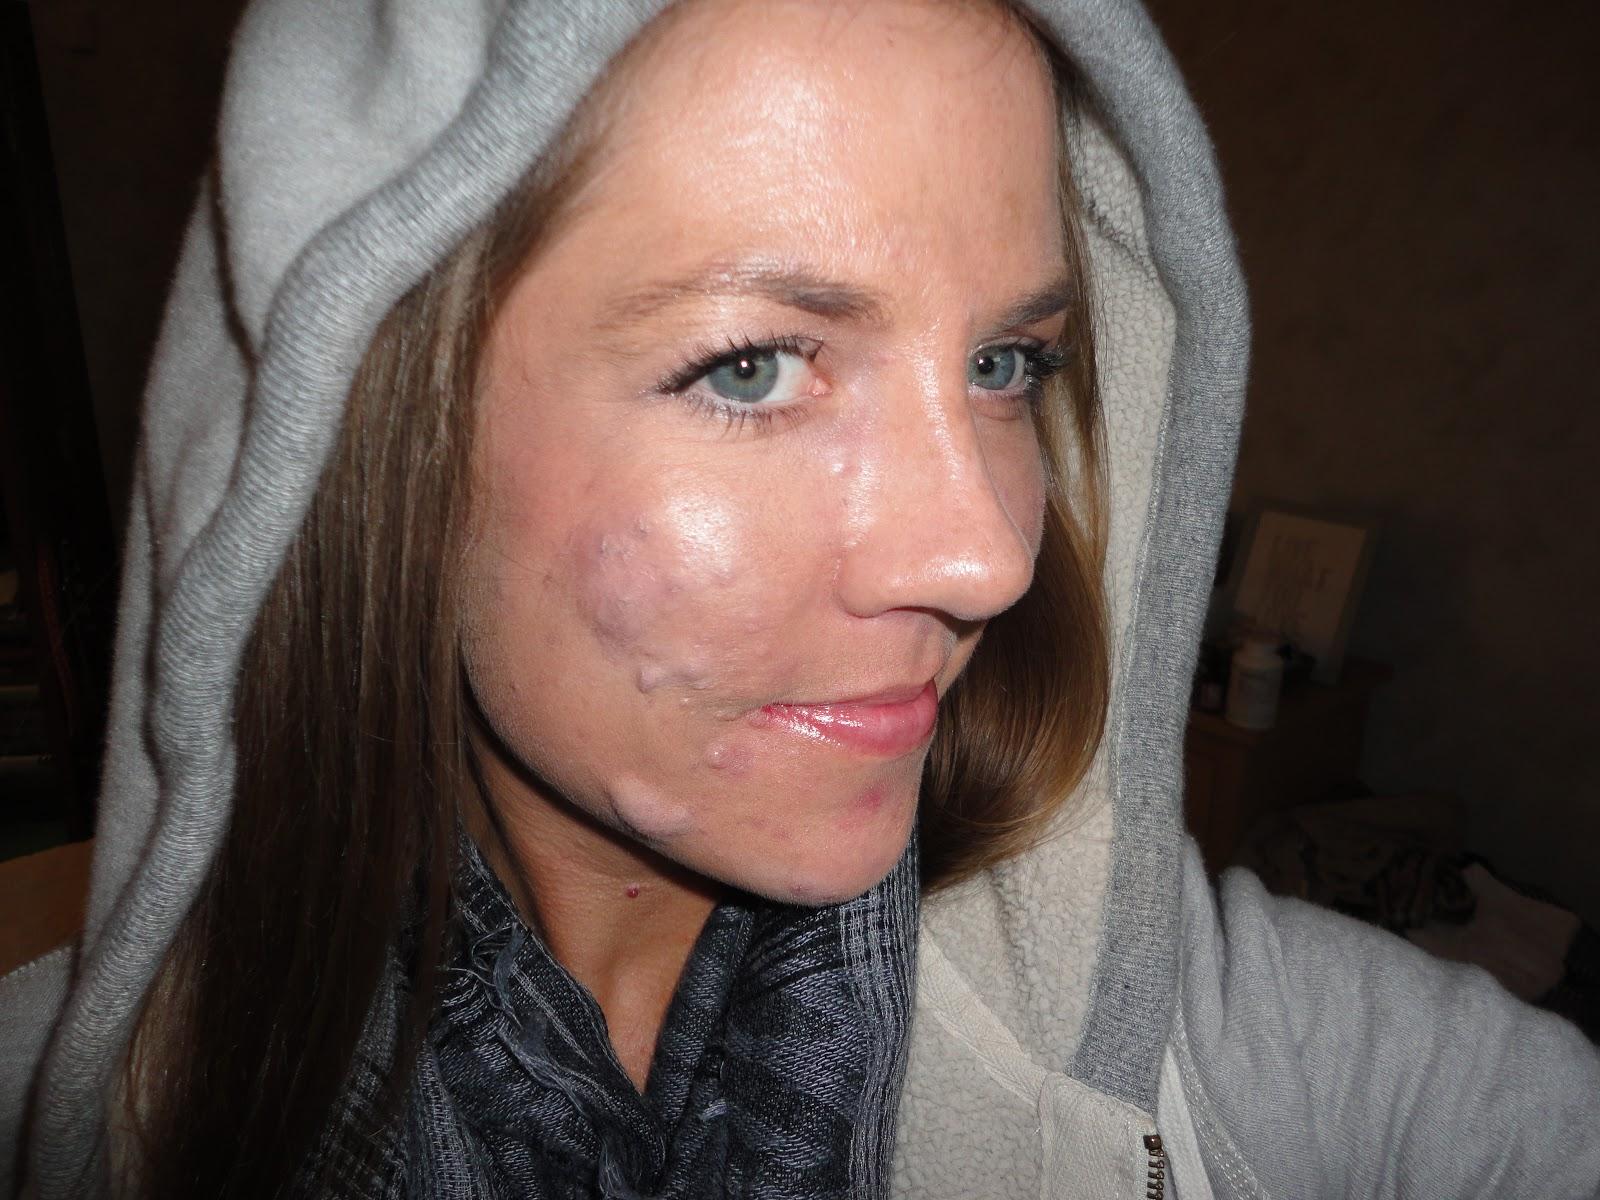 atralin acne | Skin | tomuch.us